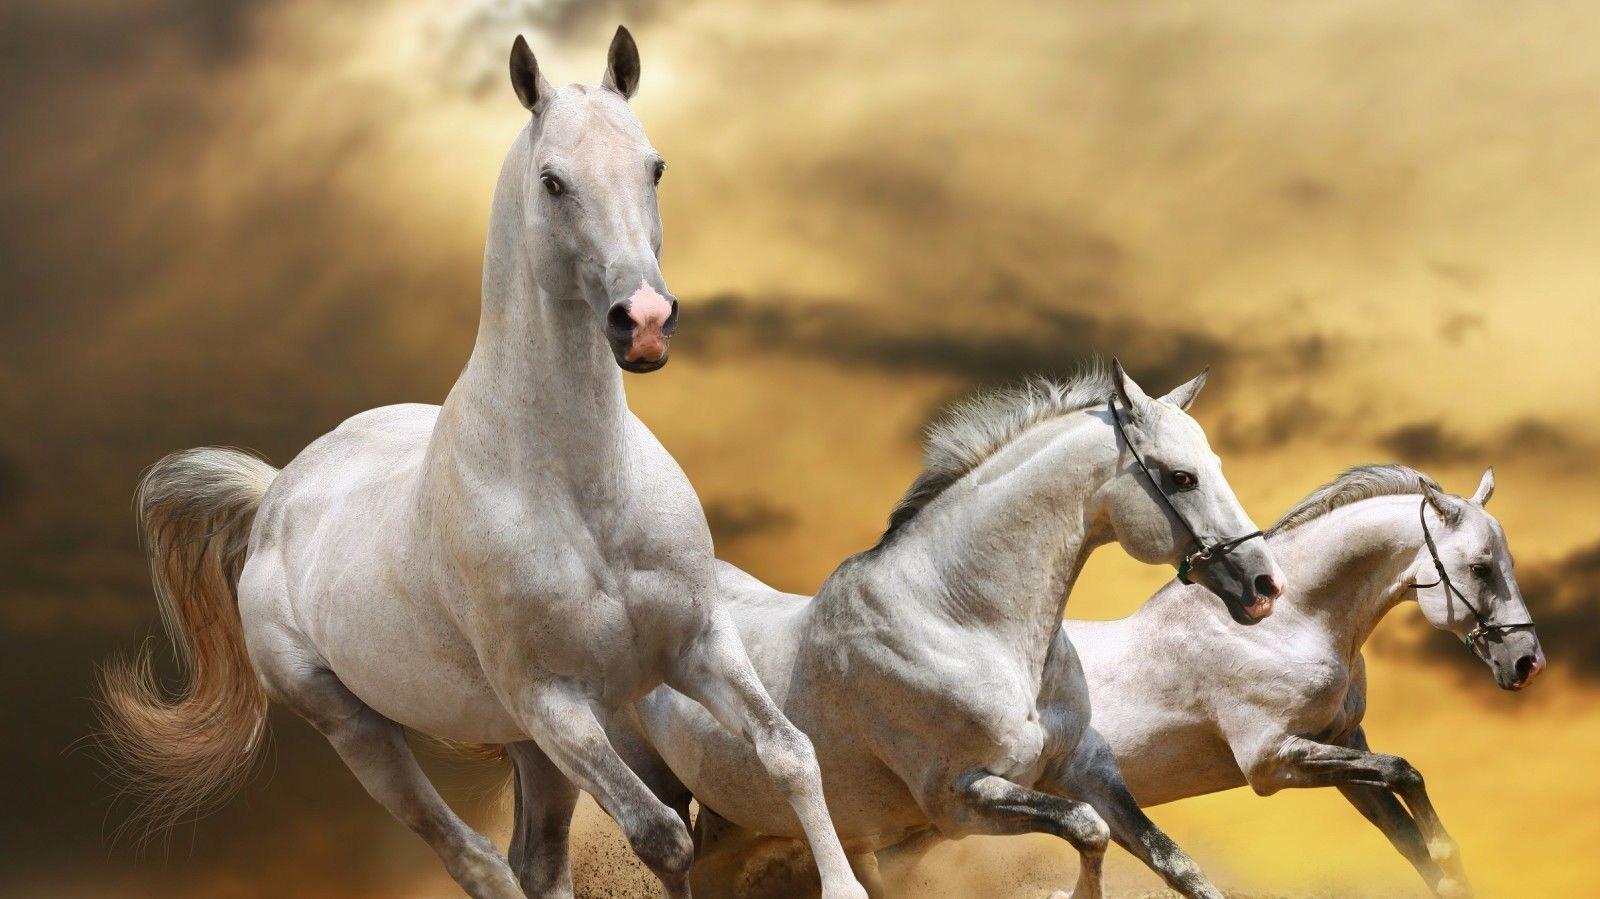 127522 Three Horses Decor WALL PRINT POSTER AU